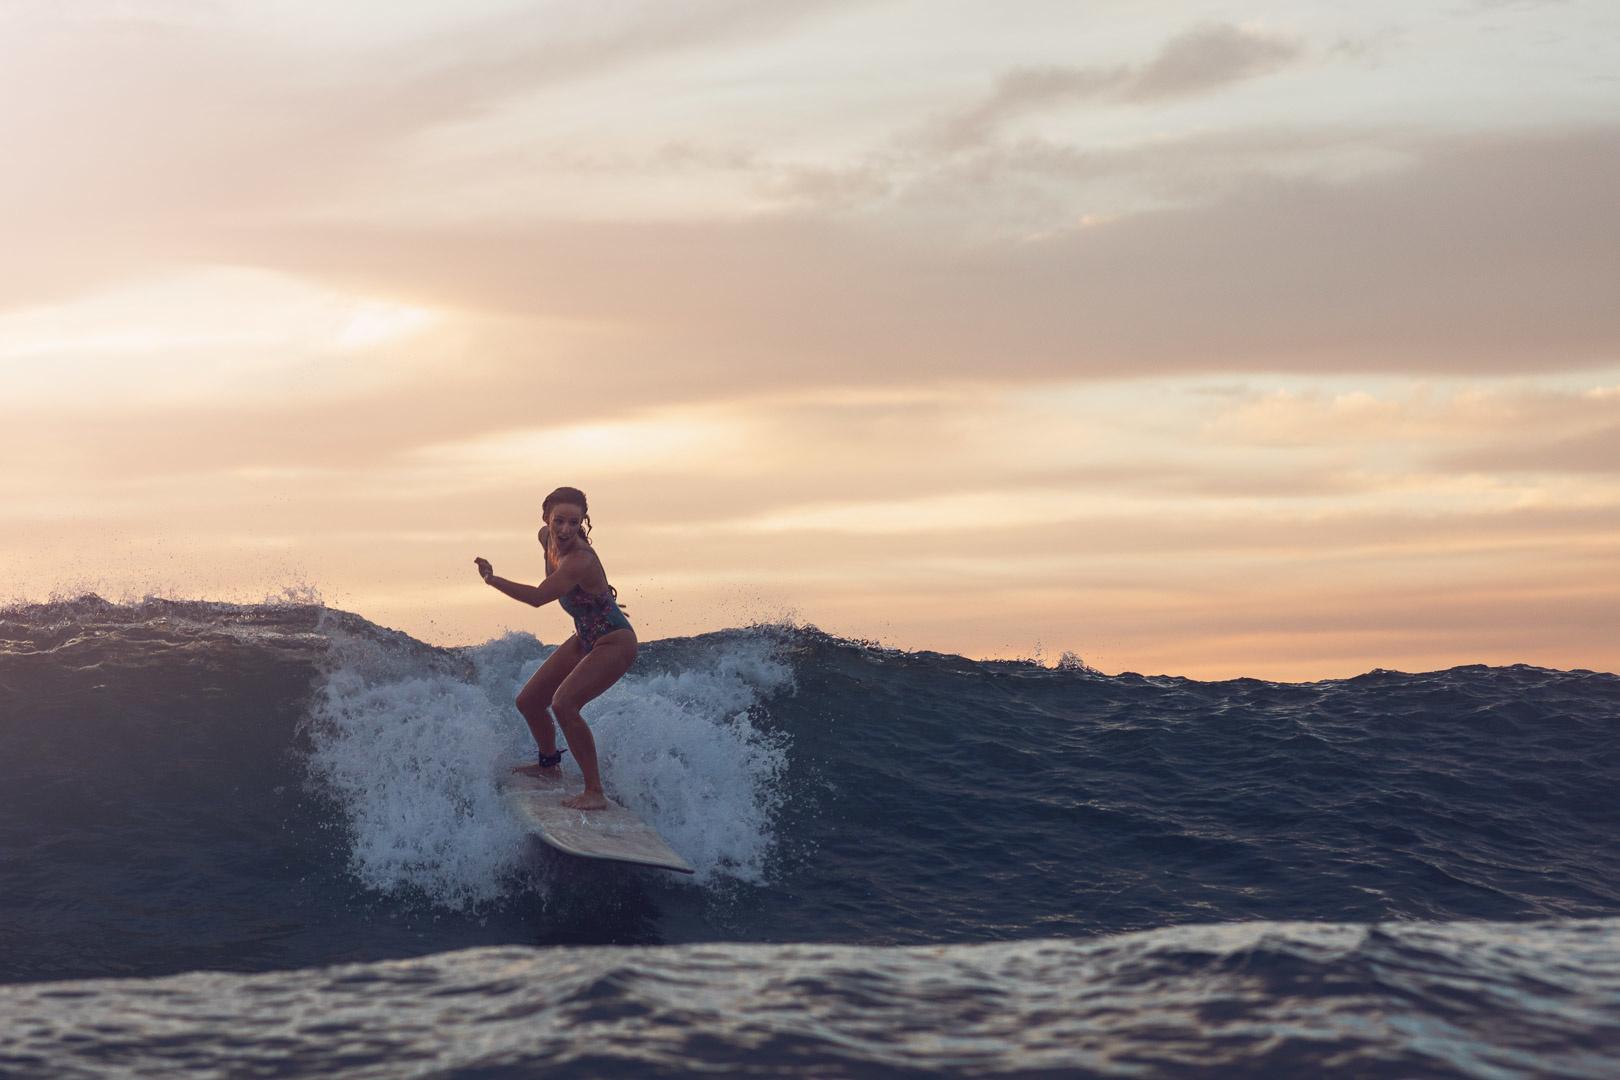 Sunrise-Surf-surfgirl.jpg